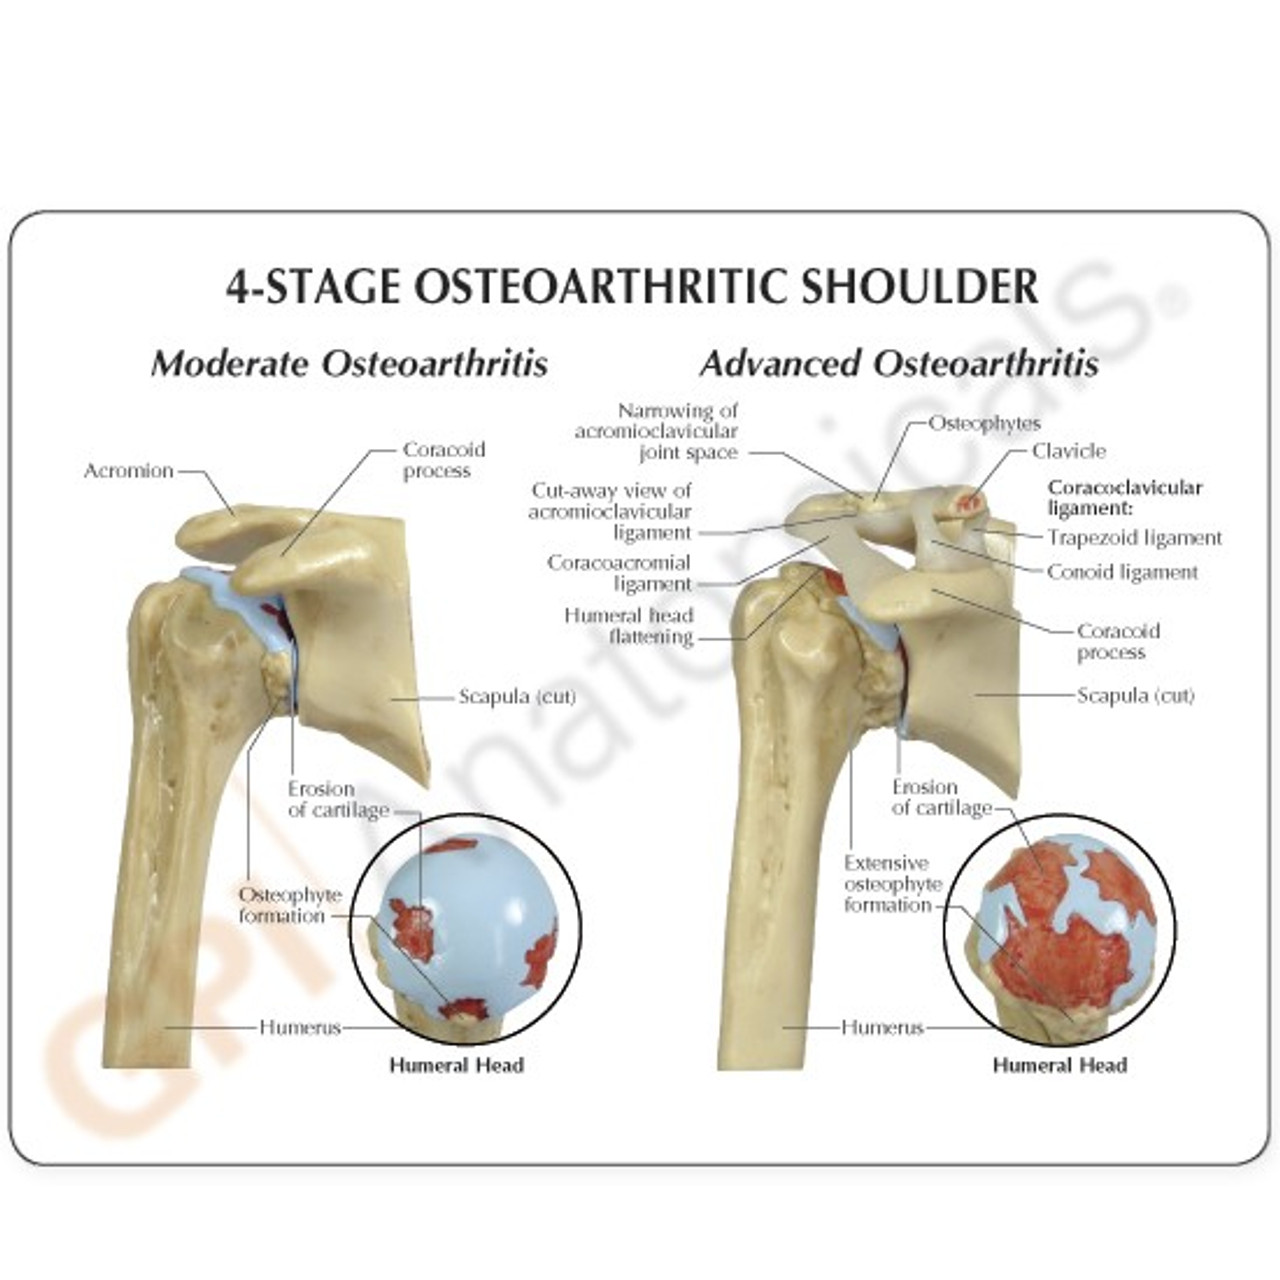 Shoulder Osteoarthritis Anatomical Model Description Card